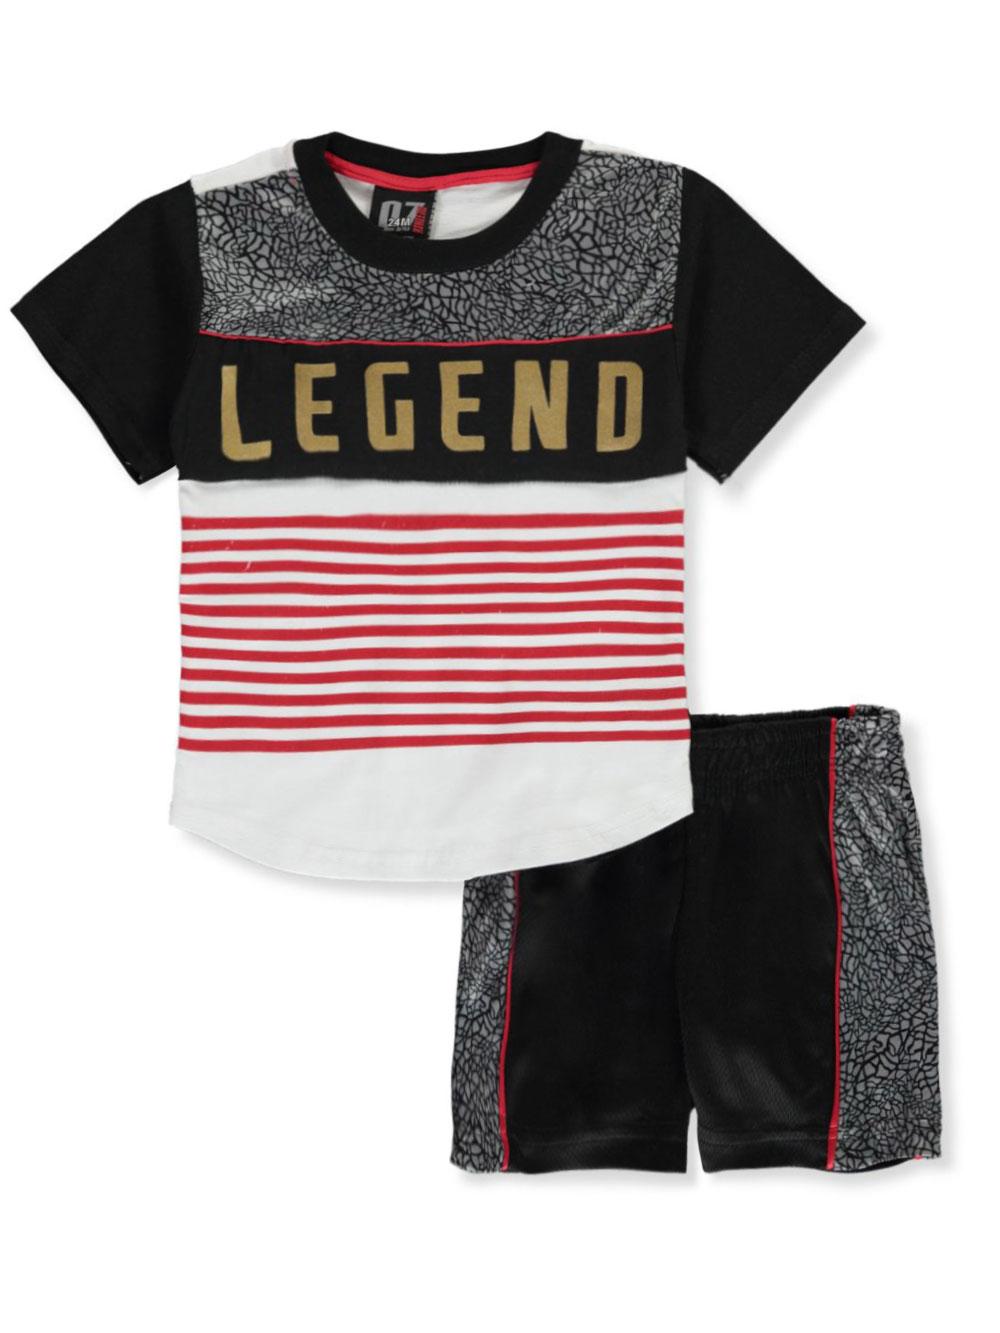 and Graphic T-Shirt Quad Seven Boys 3-Piece Pajama Set Long Pants Shorts